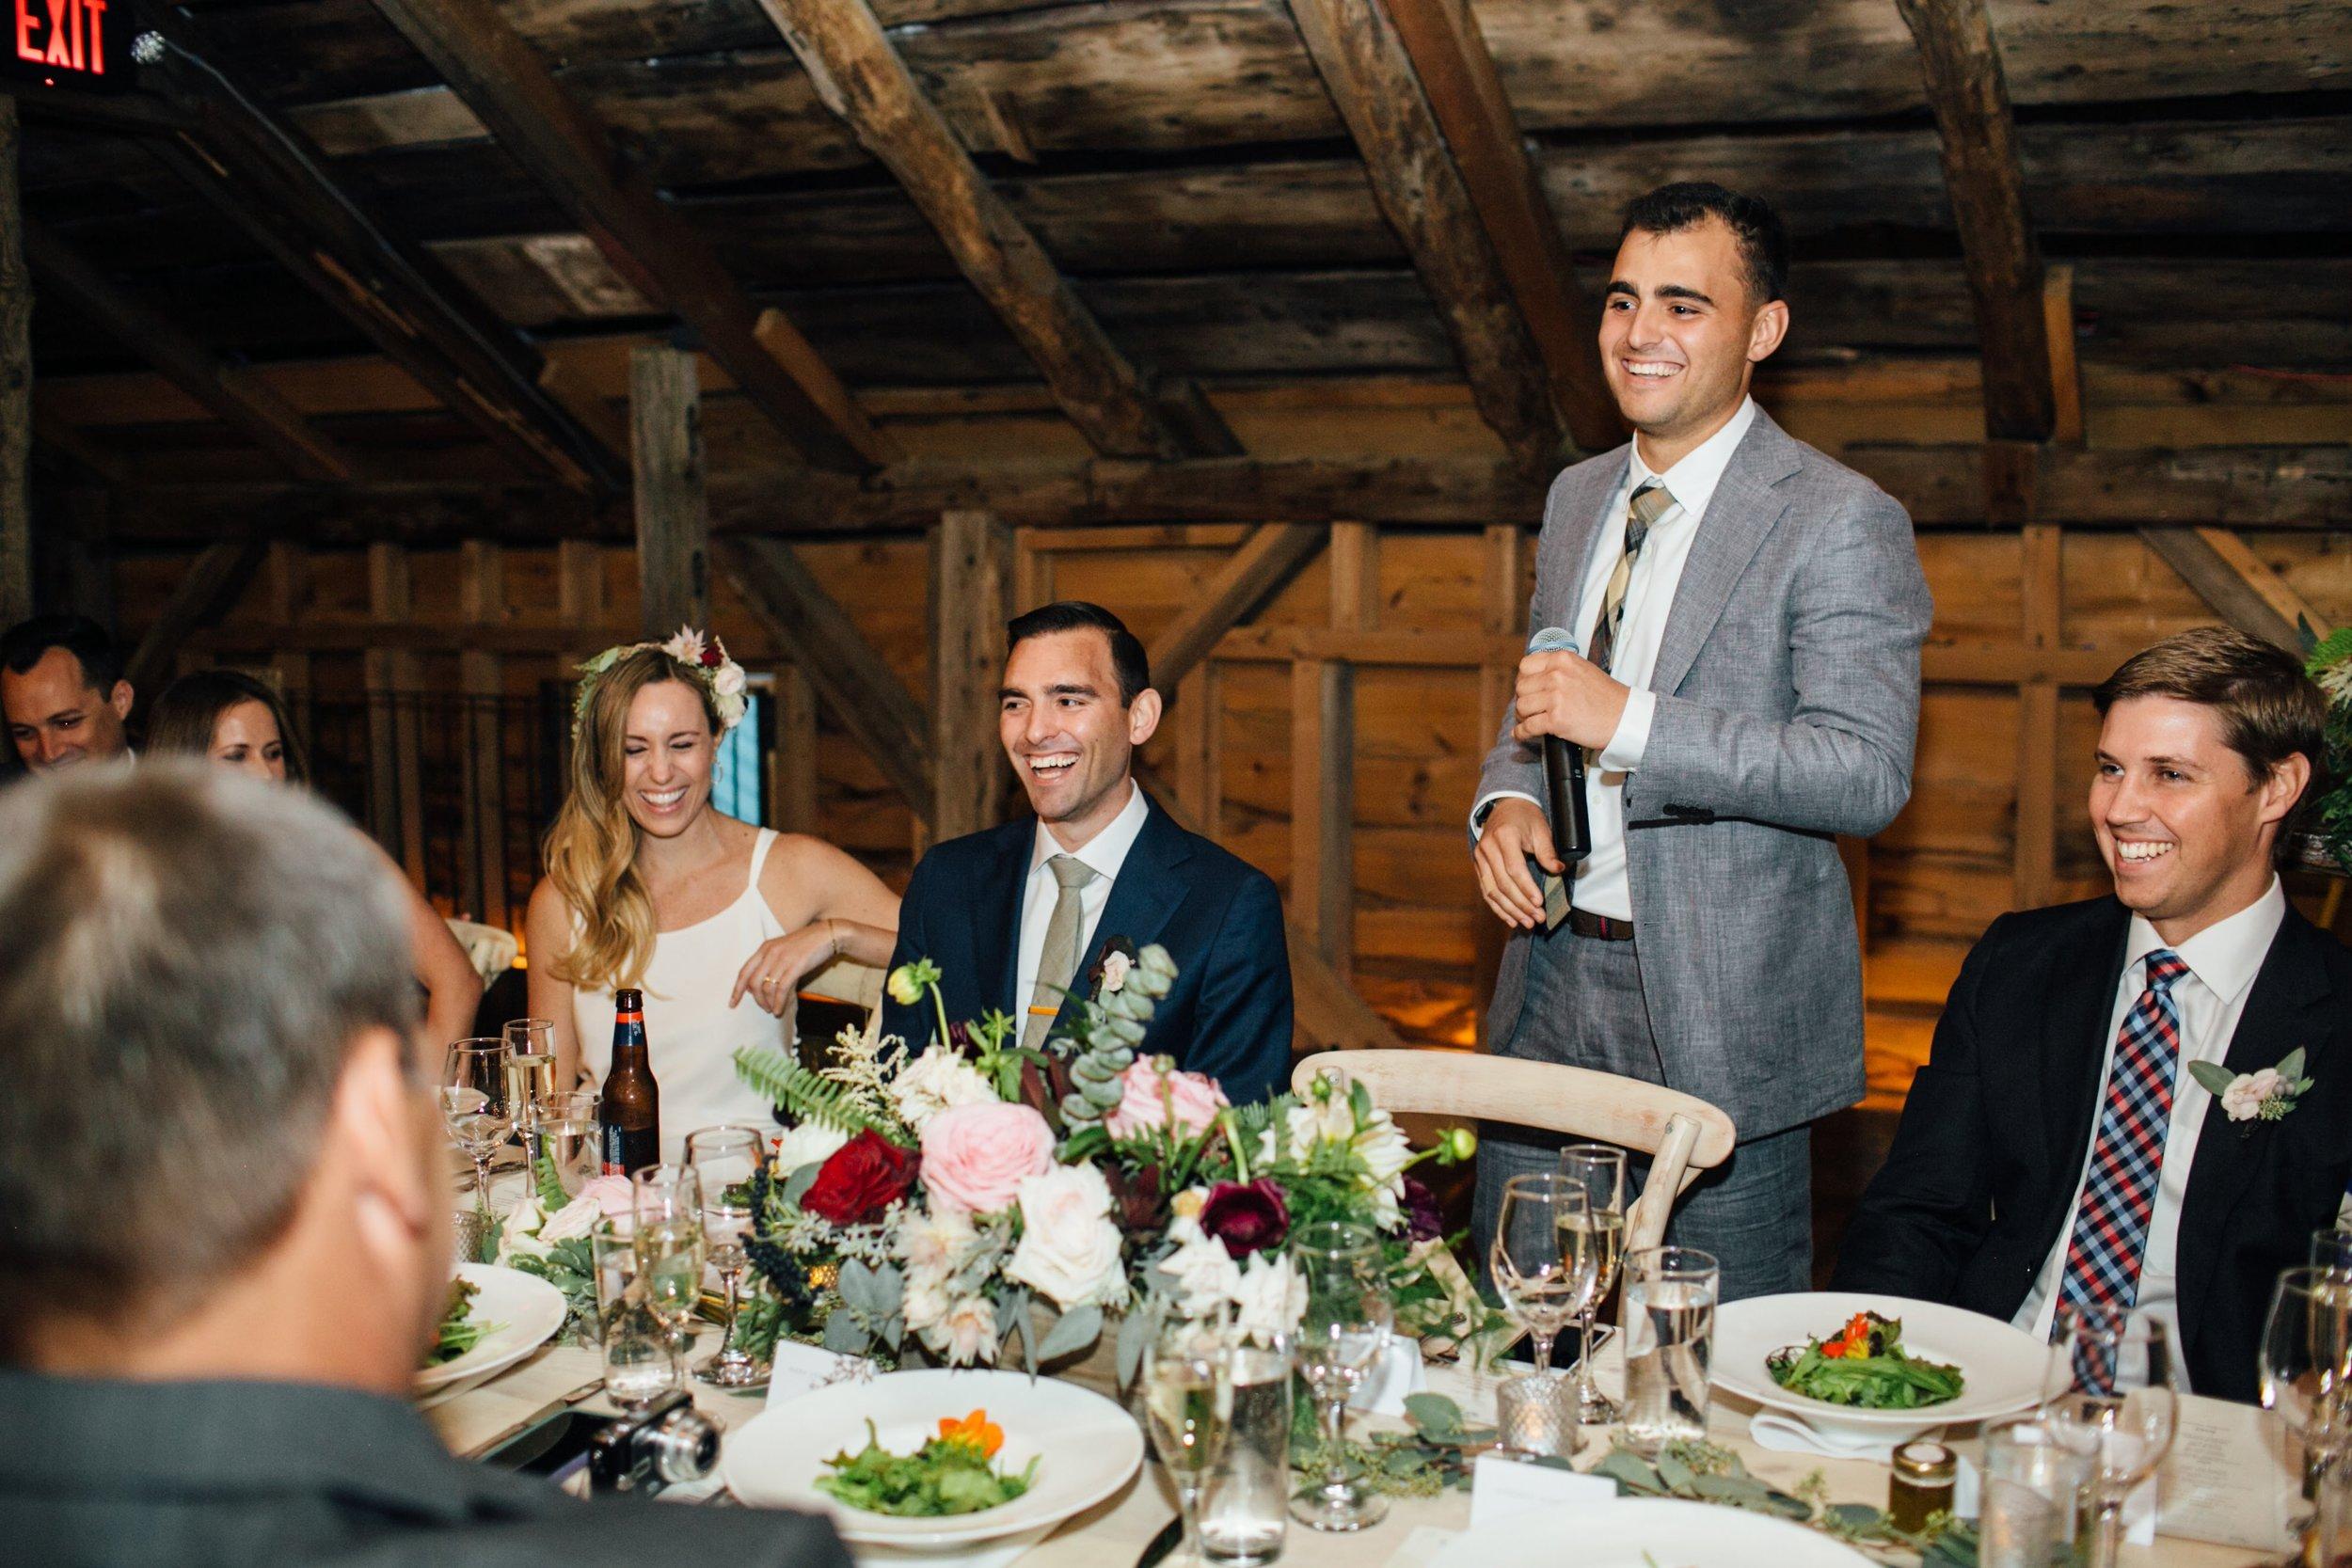 Courtney + Matt Blenheim Hill Farm Catskills NY Wedding Veronica Lola Photography 2017-591.jpg